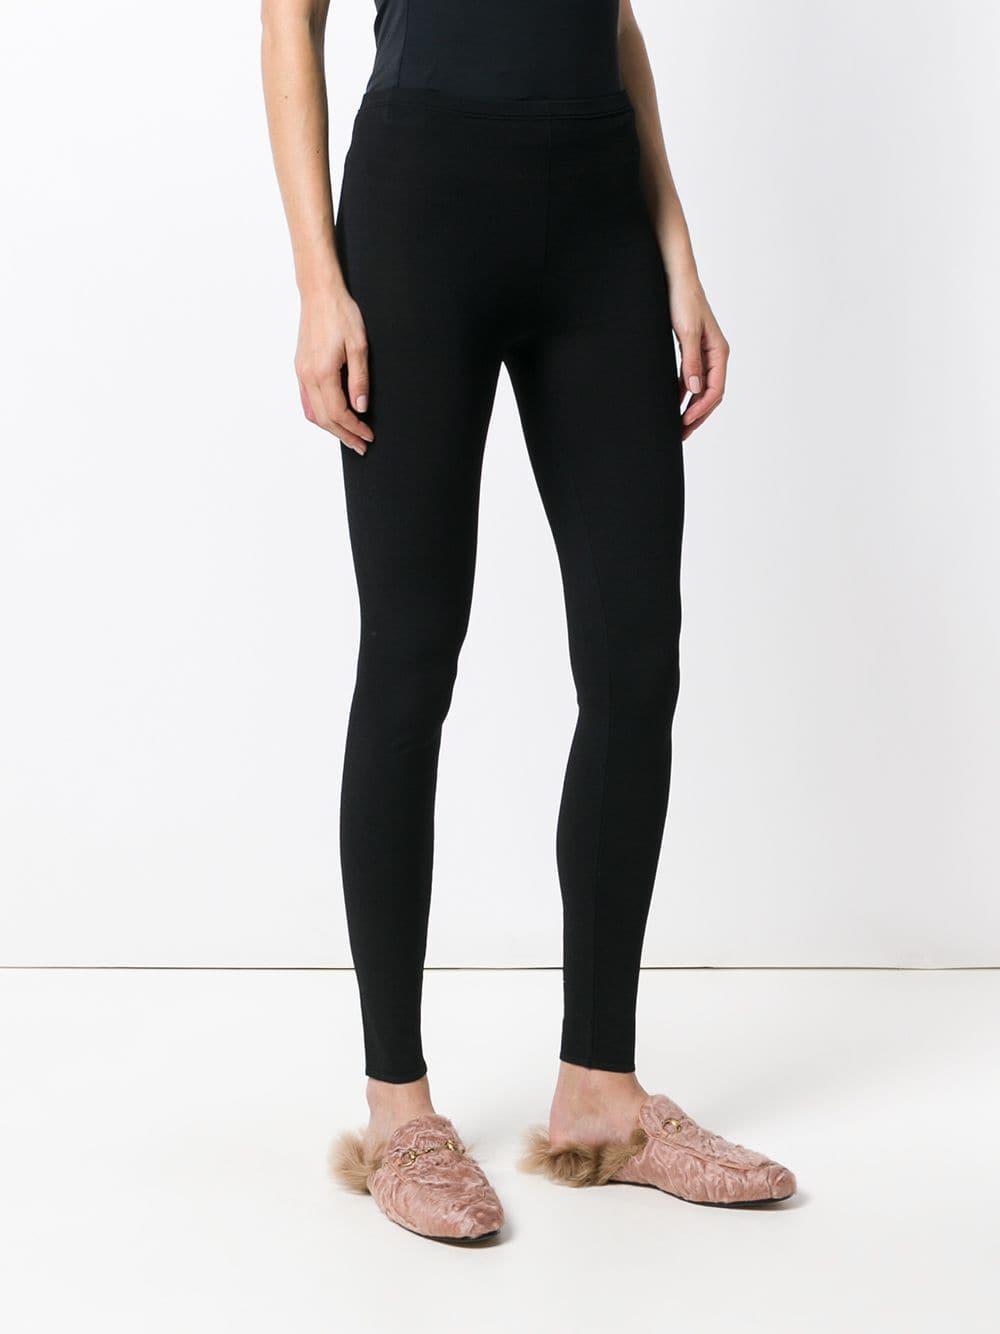 71b51fa7f0e1 Lyst - Valentino Vltn leggings in Black